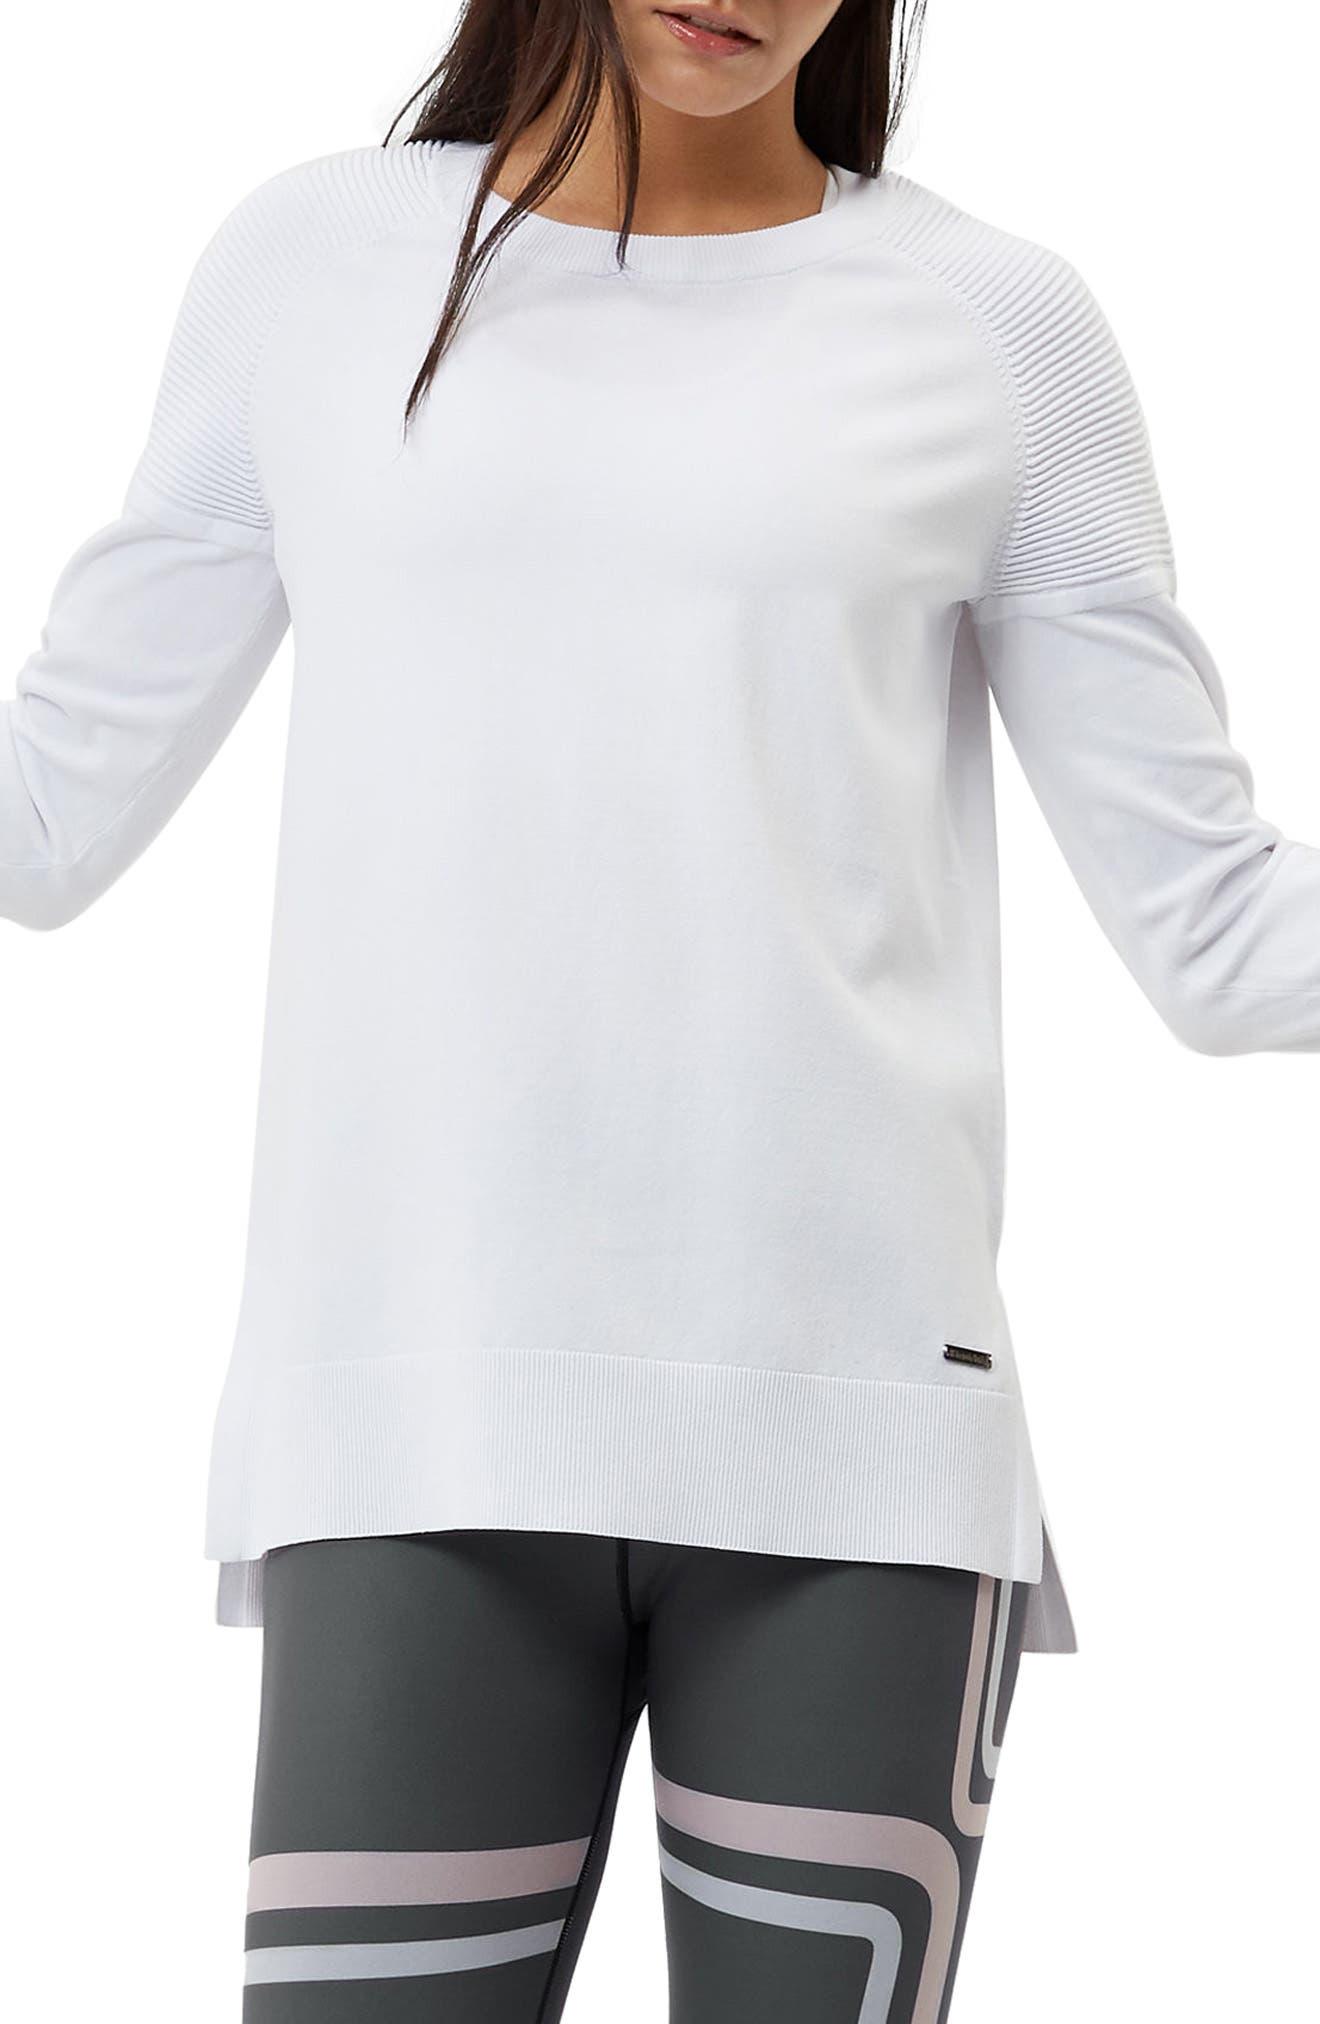 8 Track Sweatshirt,                             Main thumbnail 1, color,                             White